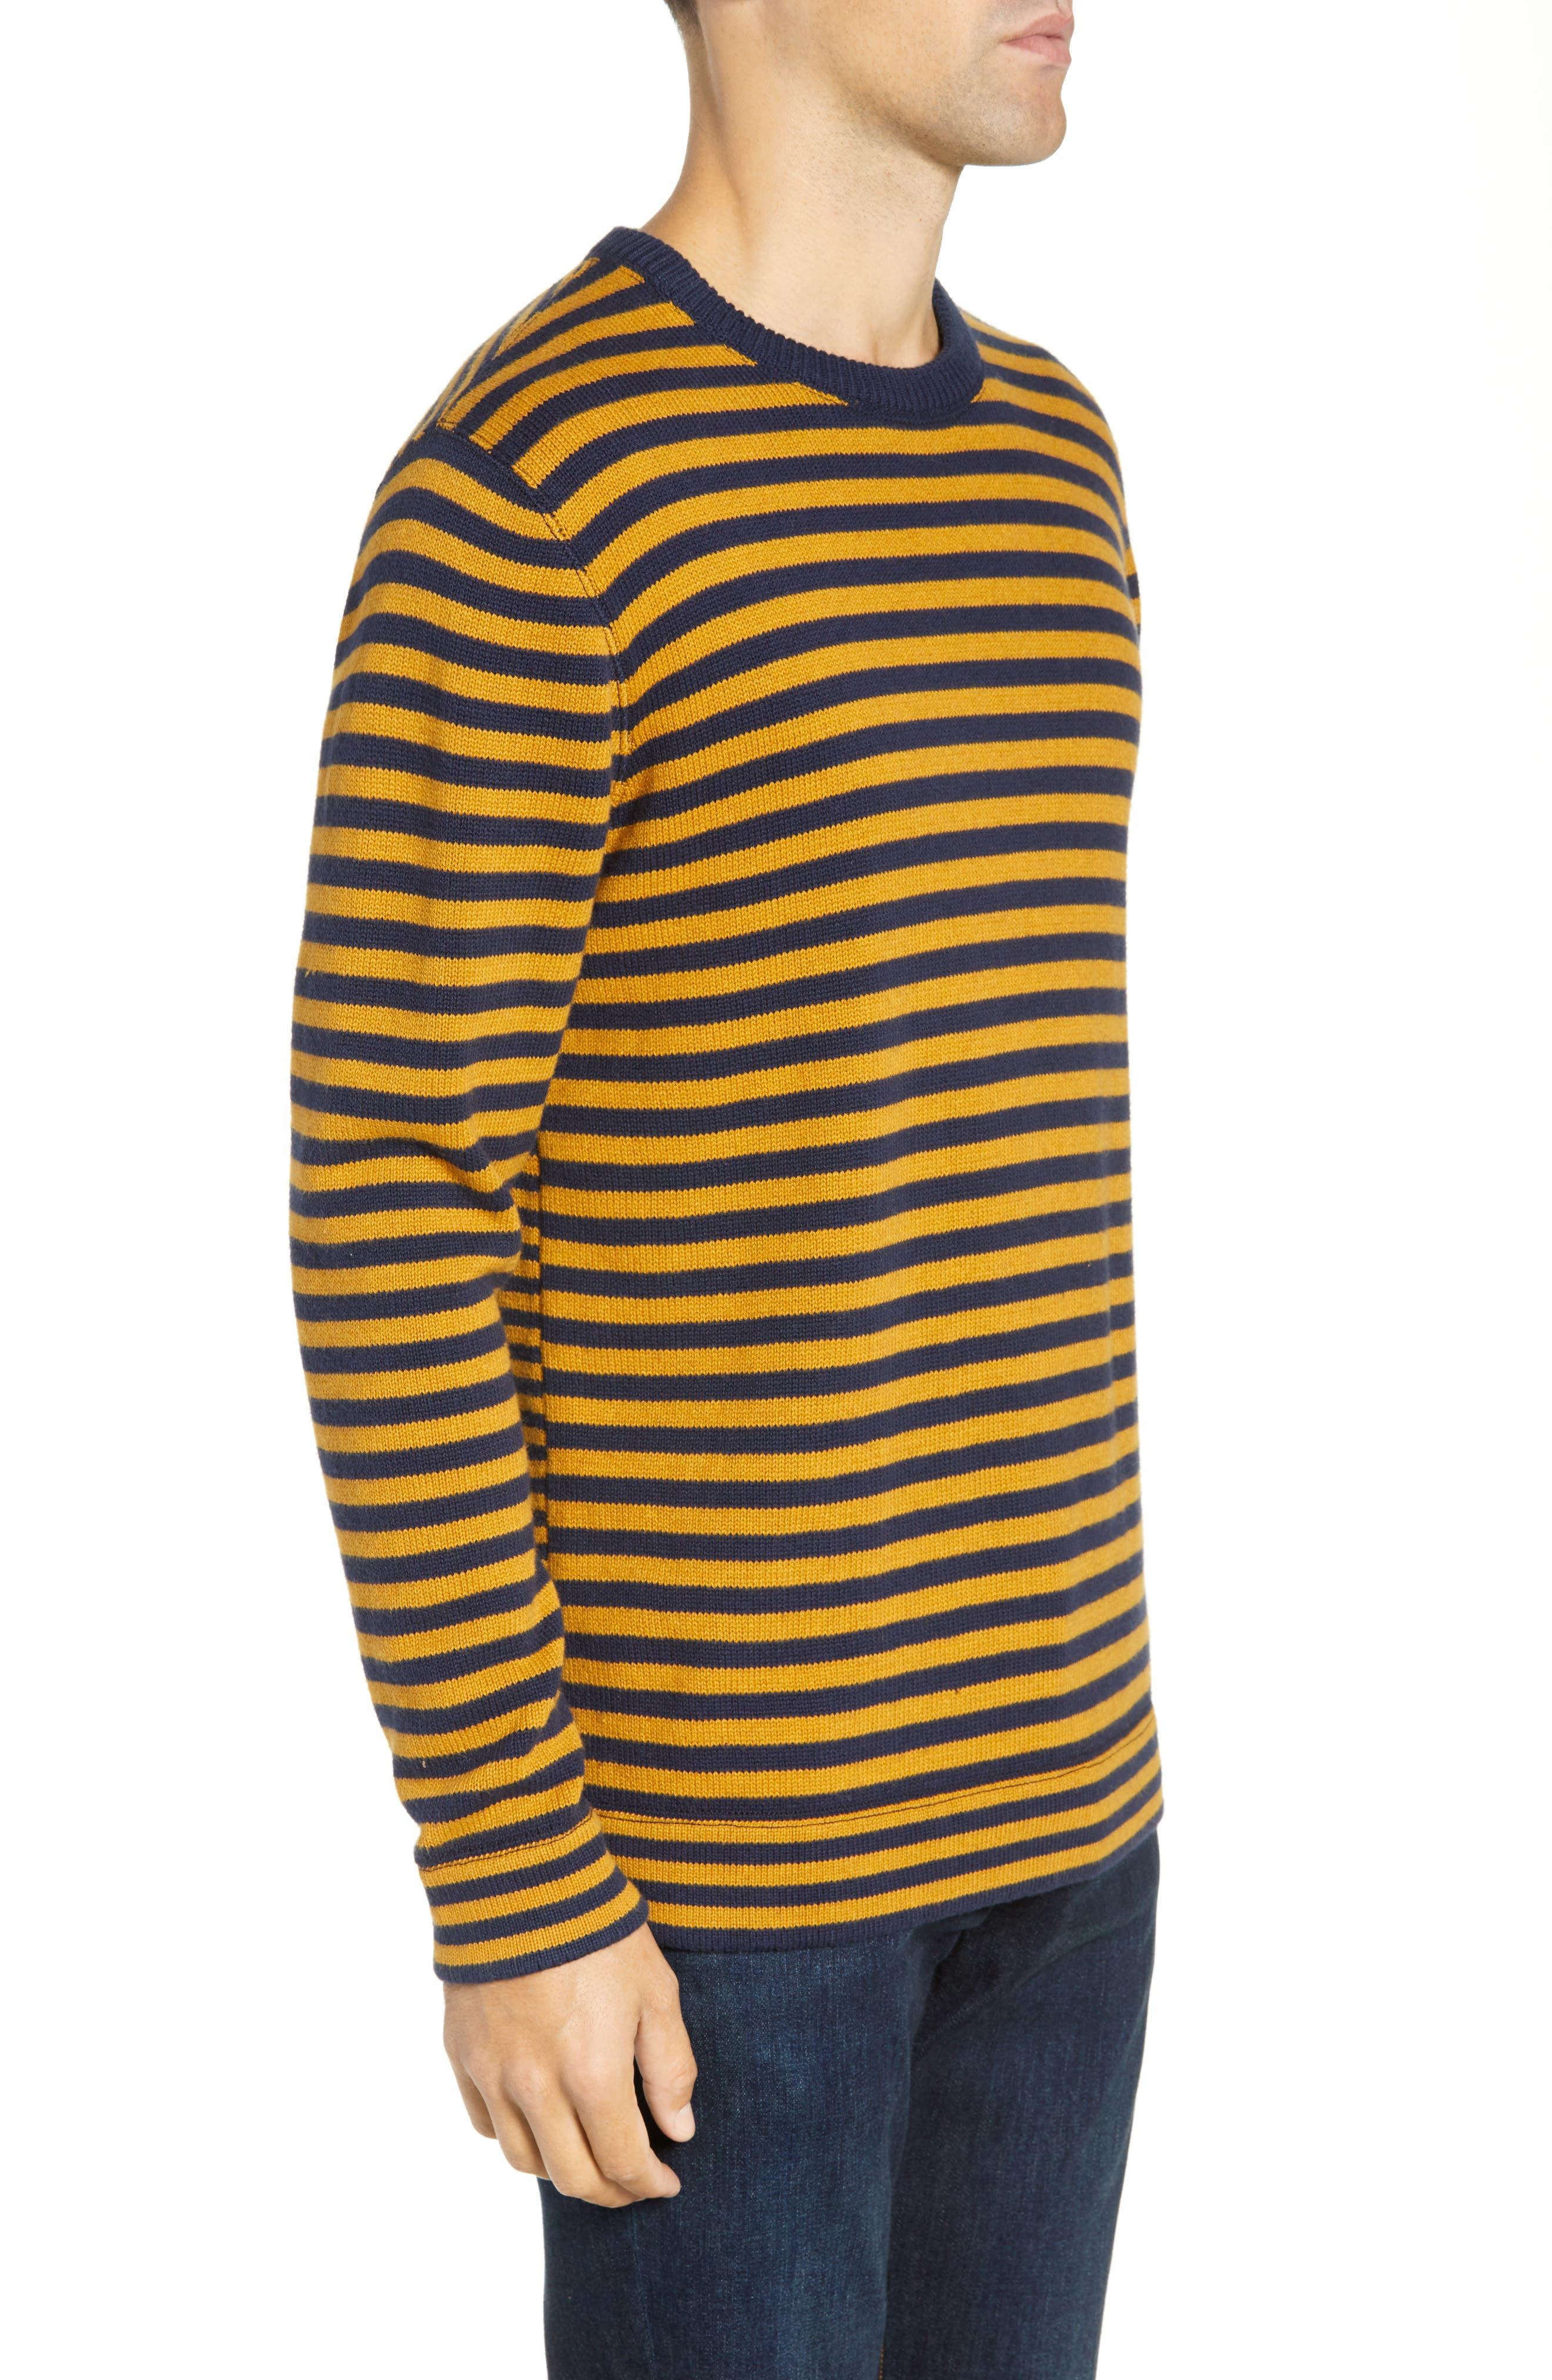 Stripe Cotton & Wool Sweater,                             Alternate thumbnail 3, color,                             CALLUNA YELLOW UTILITY BLUE